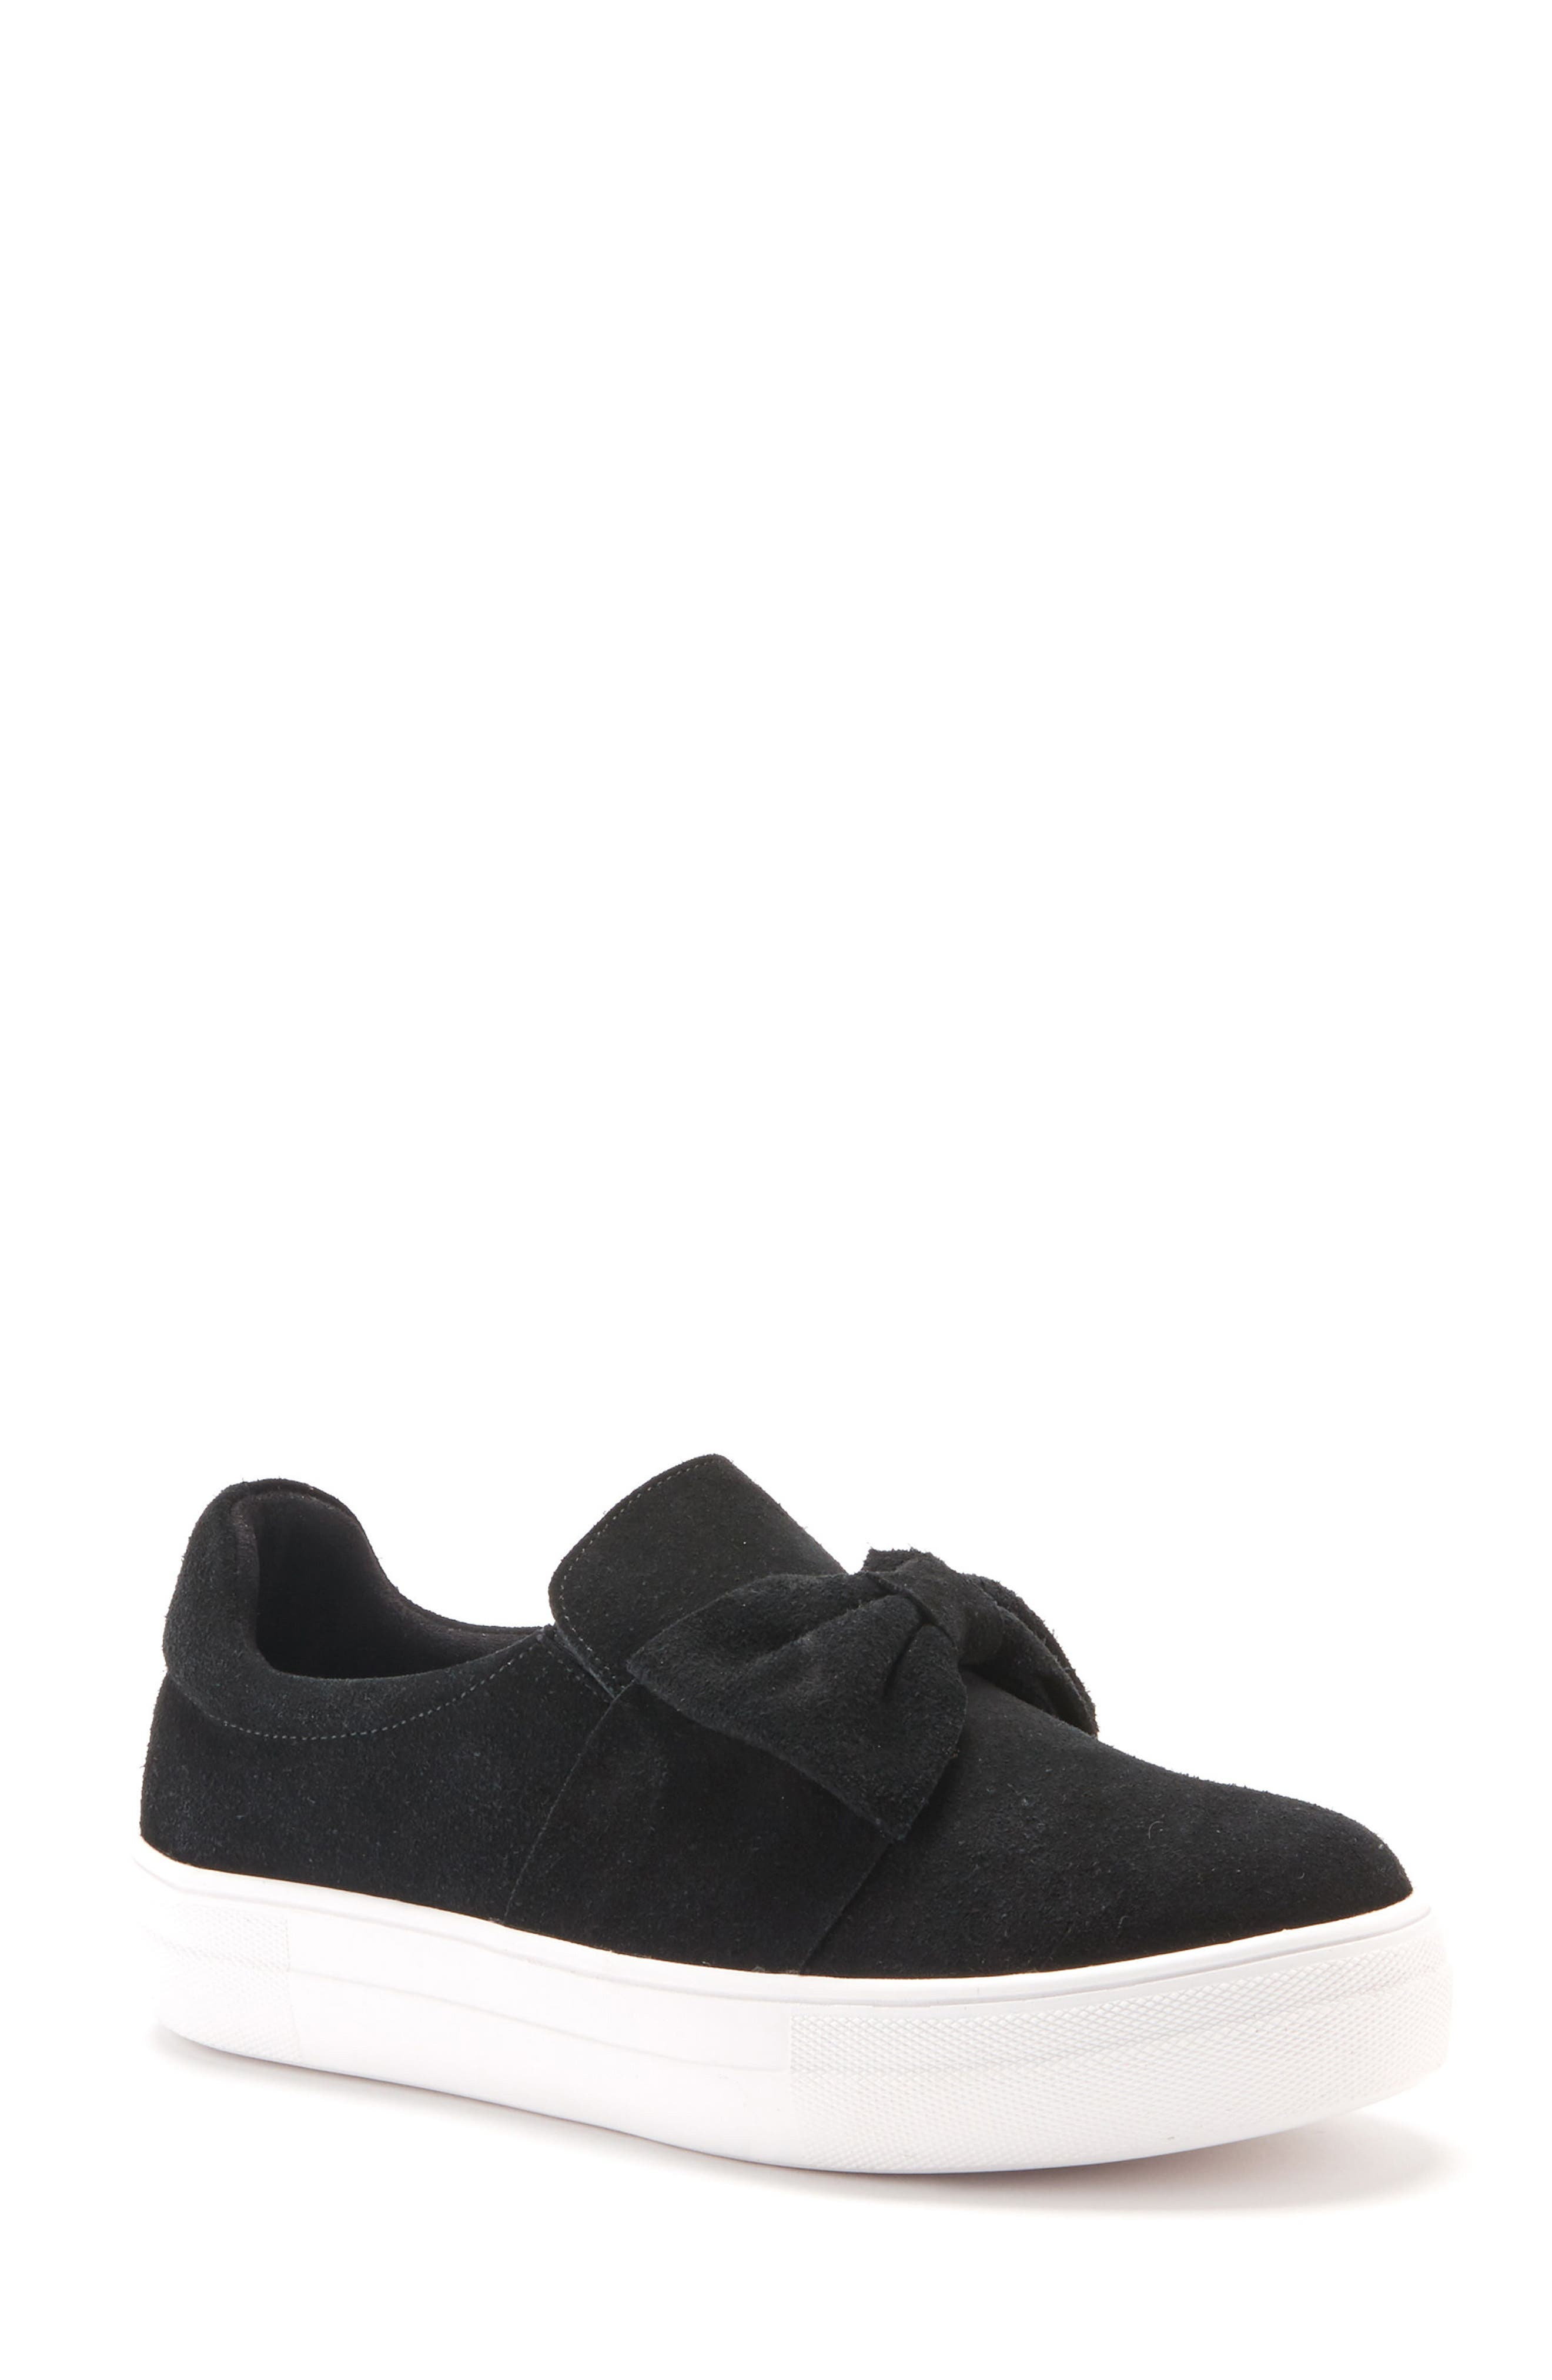 Gigi Sneaker,                         Main,                         color, Black Suede